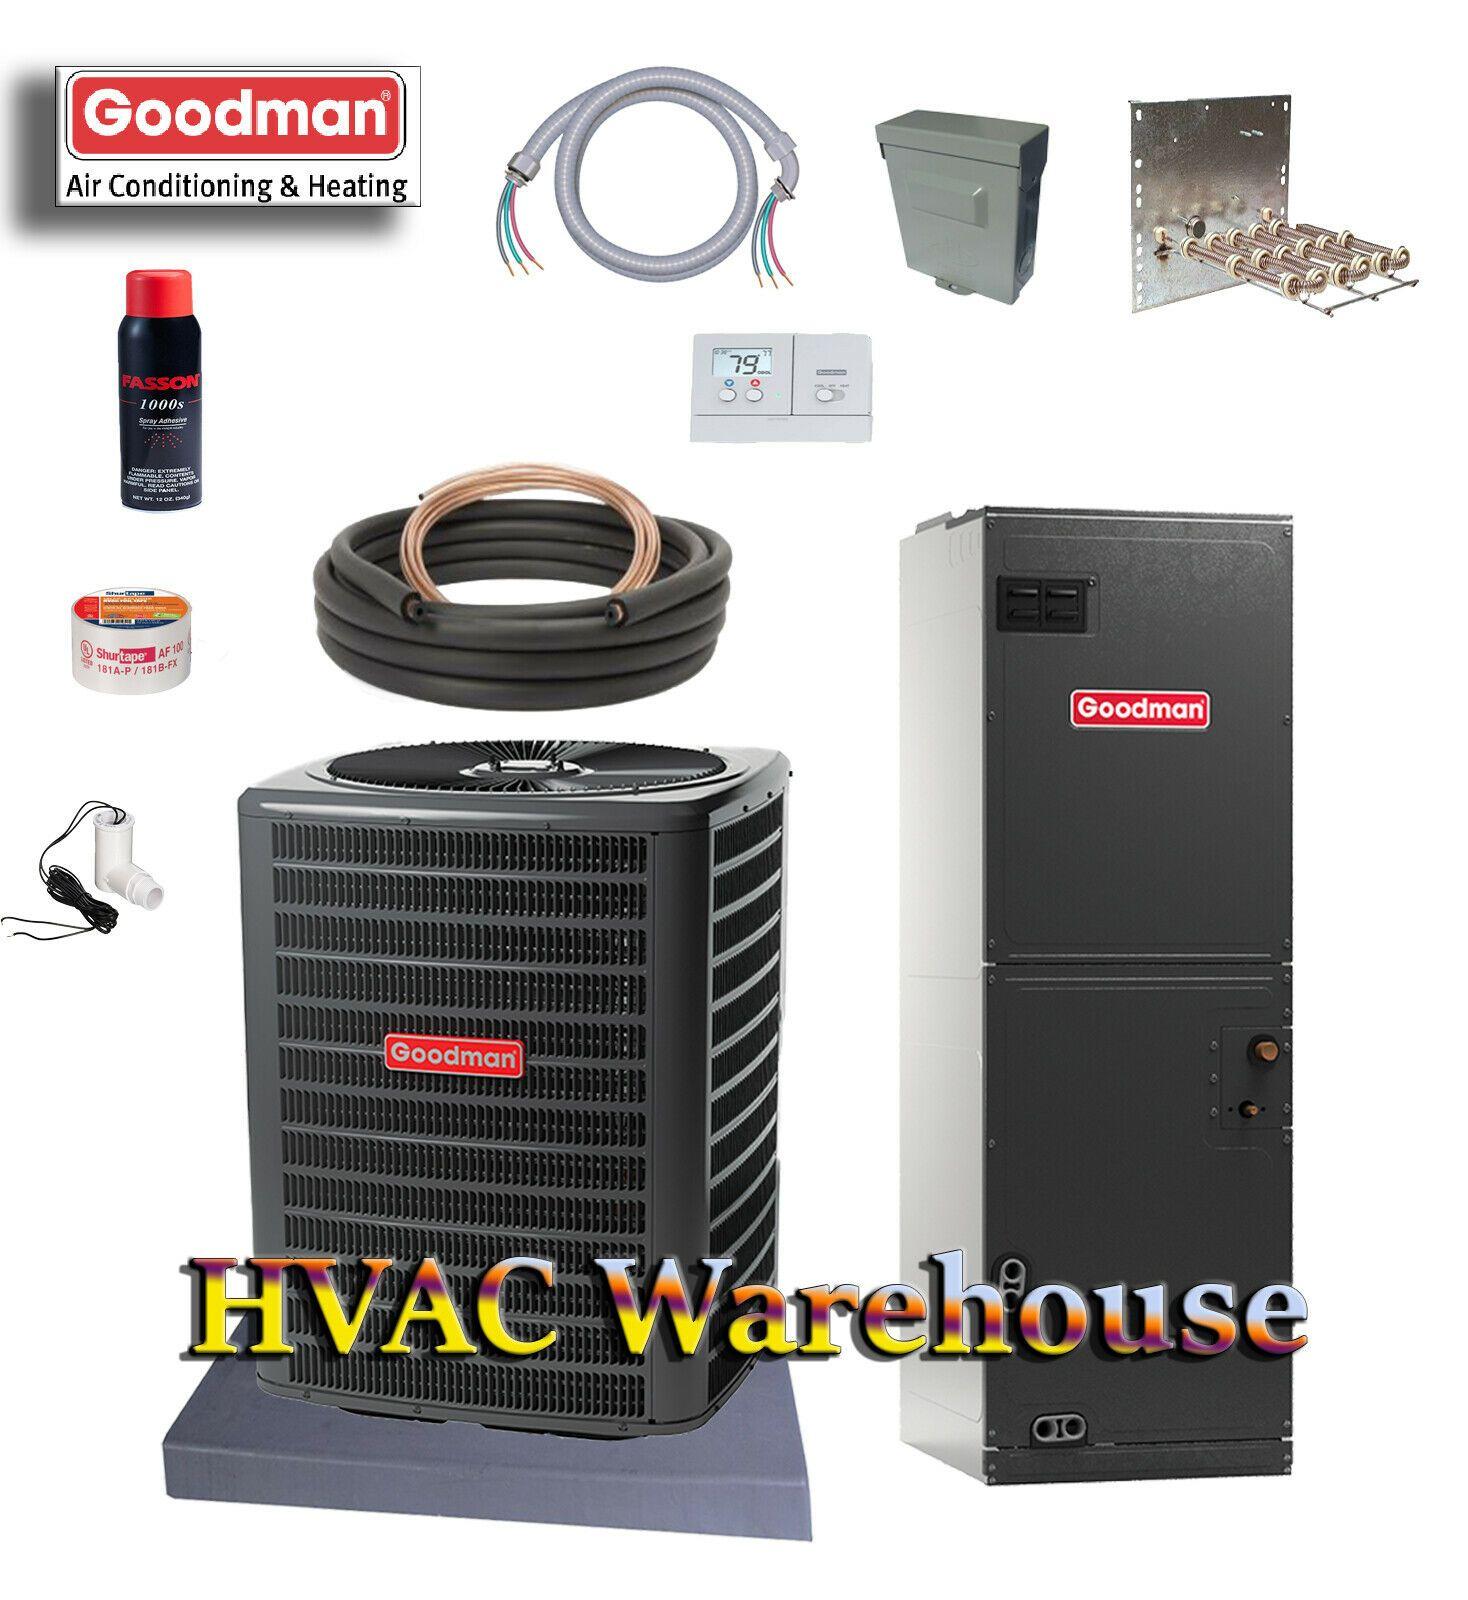 3 Ton Heat Pump Split System in 2020 Heat pump, Heat